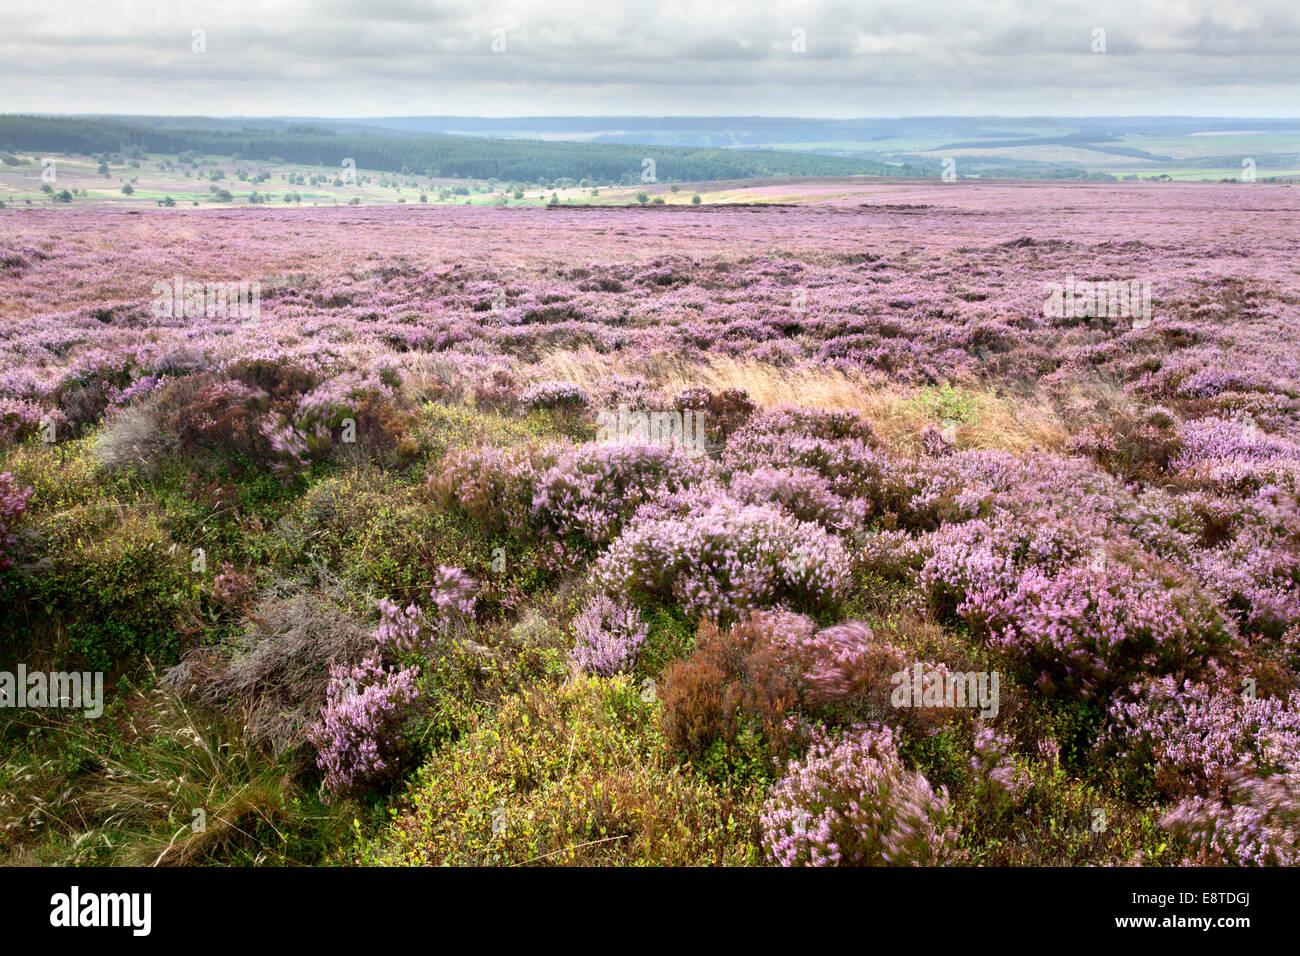 Heather Moorland from Stony Marl Howes Fylingdales Moor North York Moors Yorkshire England - Stock Image